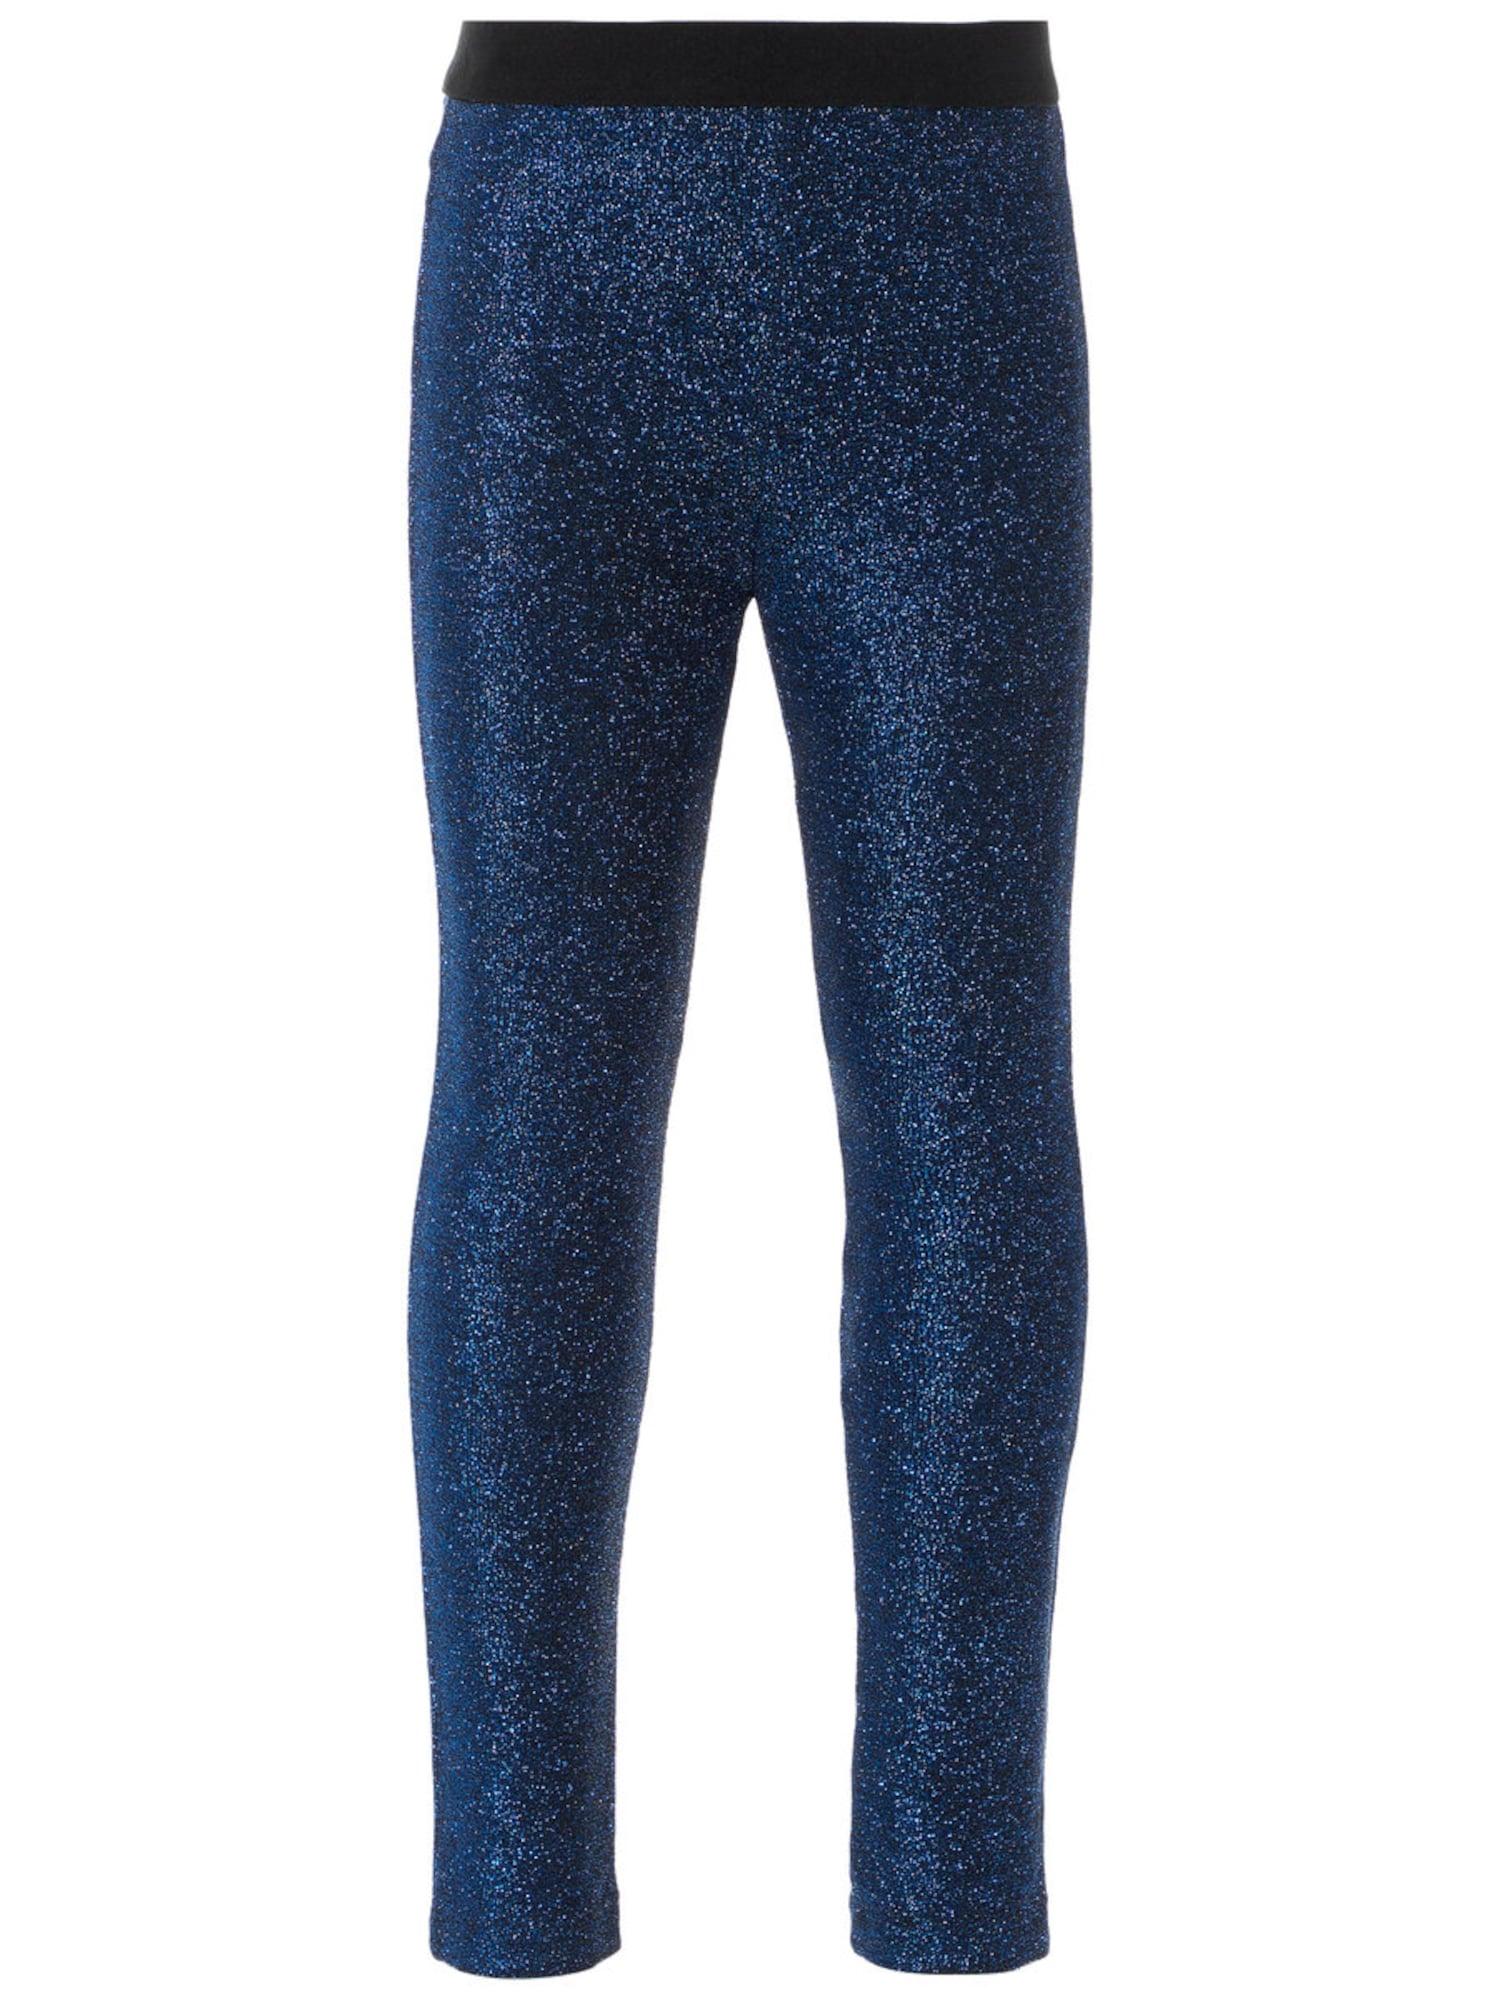 NAME IT Mini Glitter Legging Dames Blauw